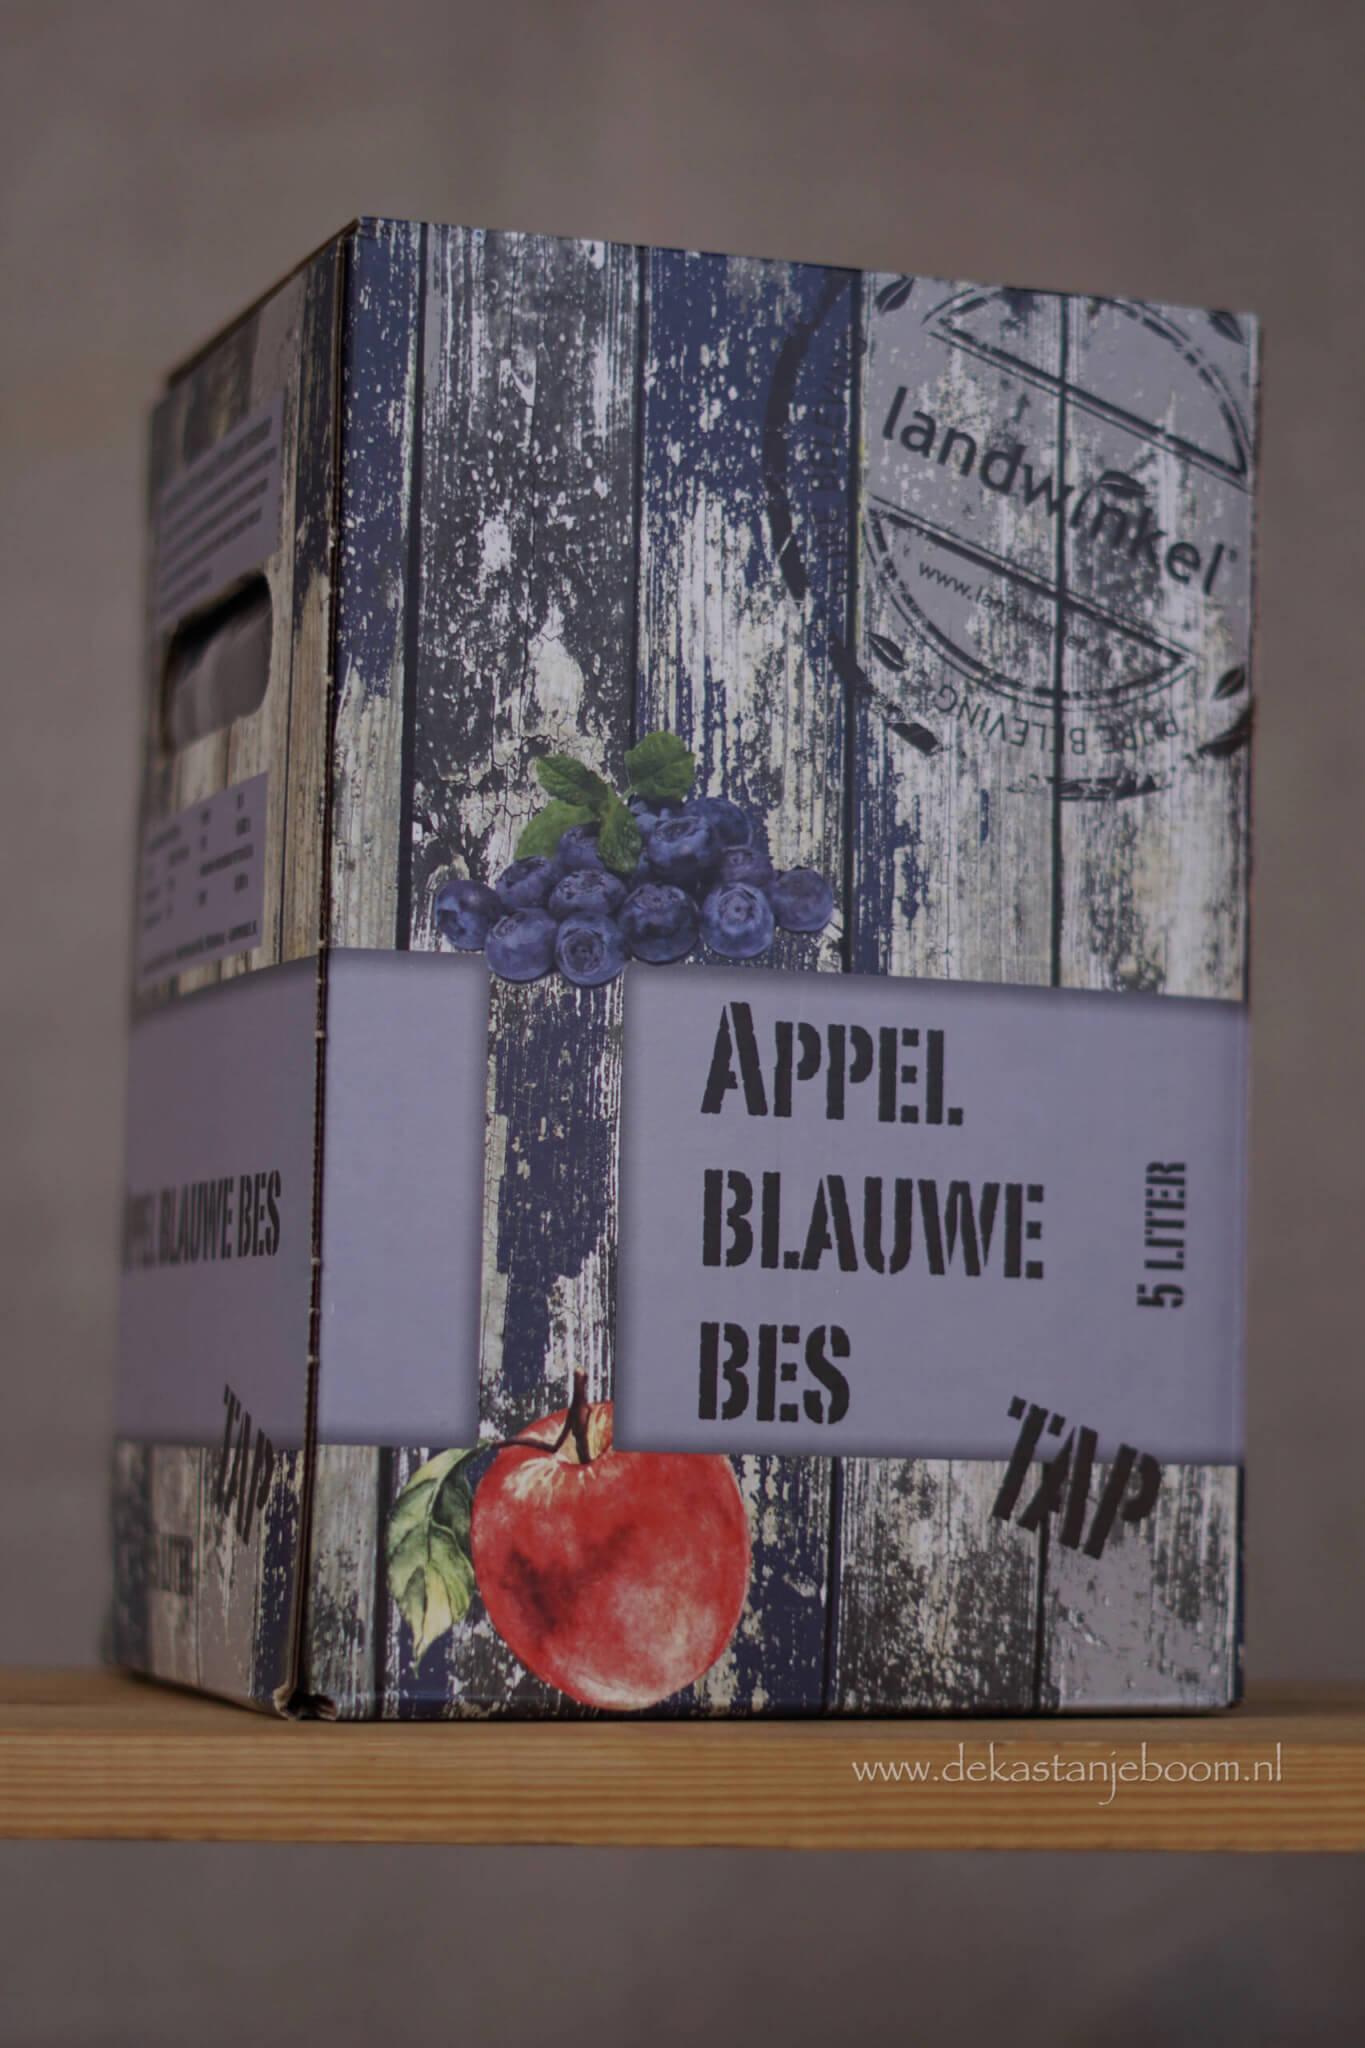 Tap appel blauwe bes 5 liter